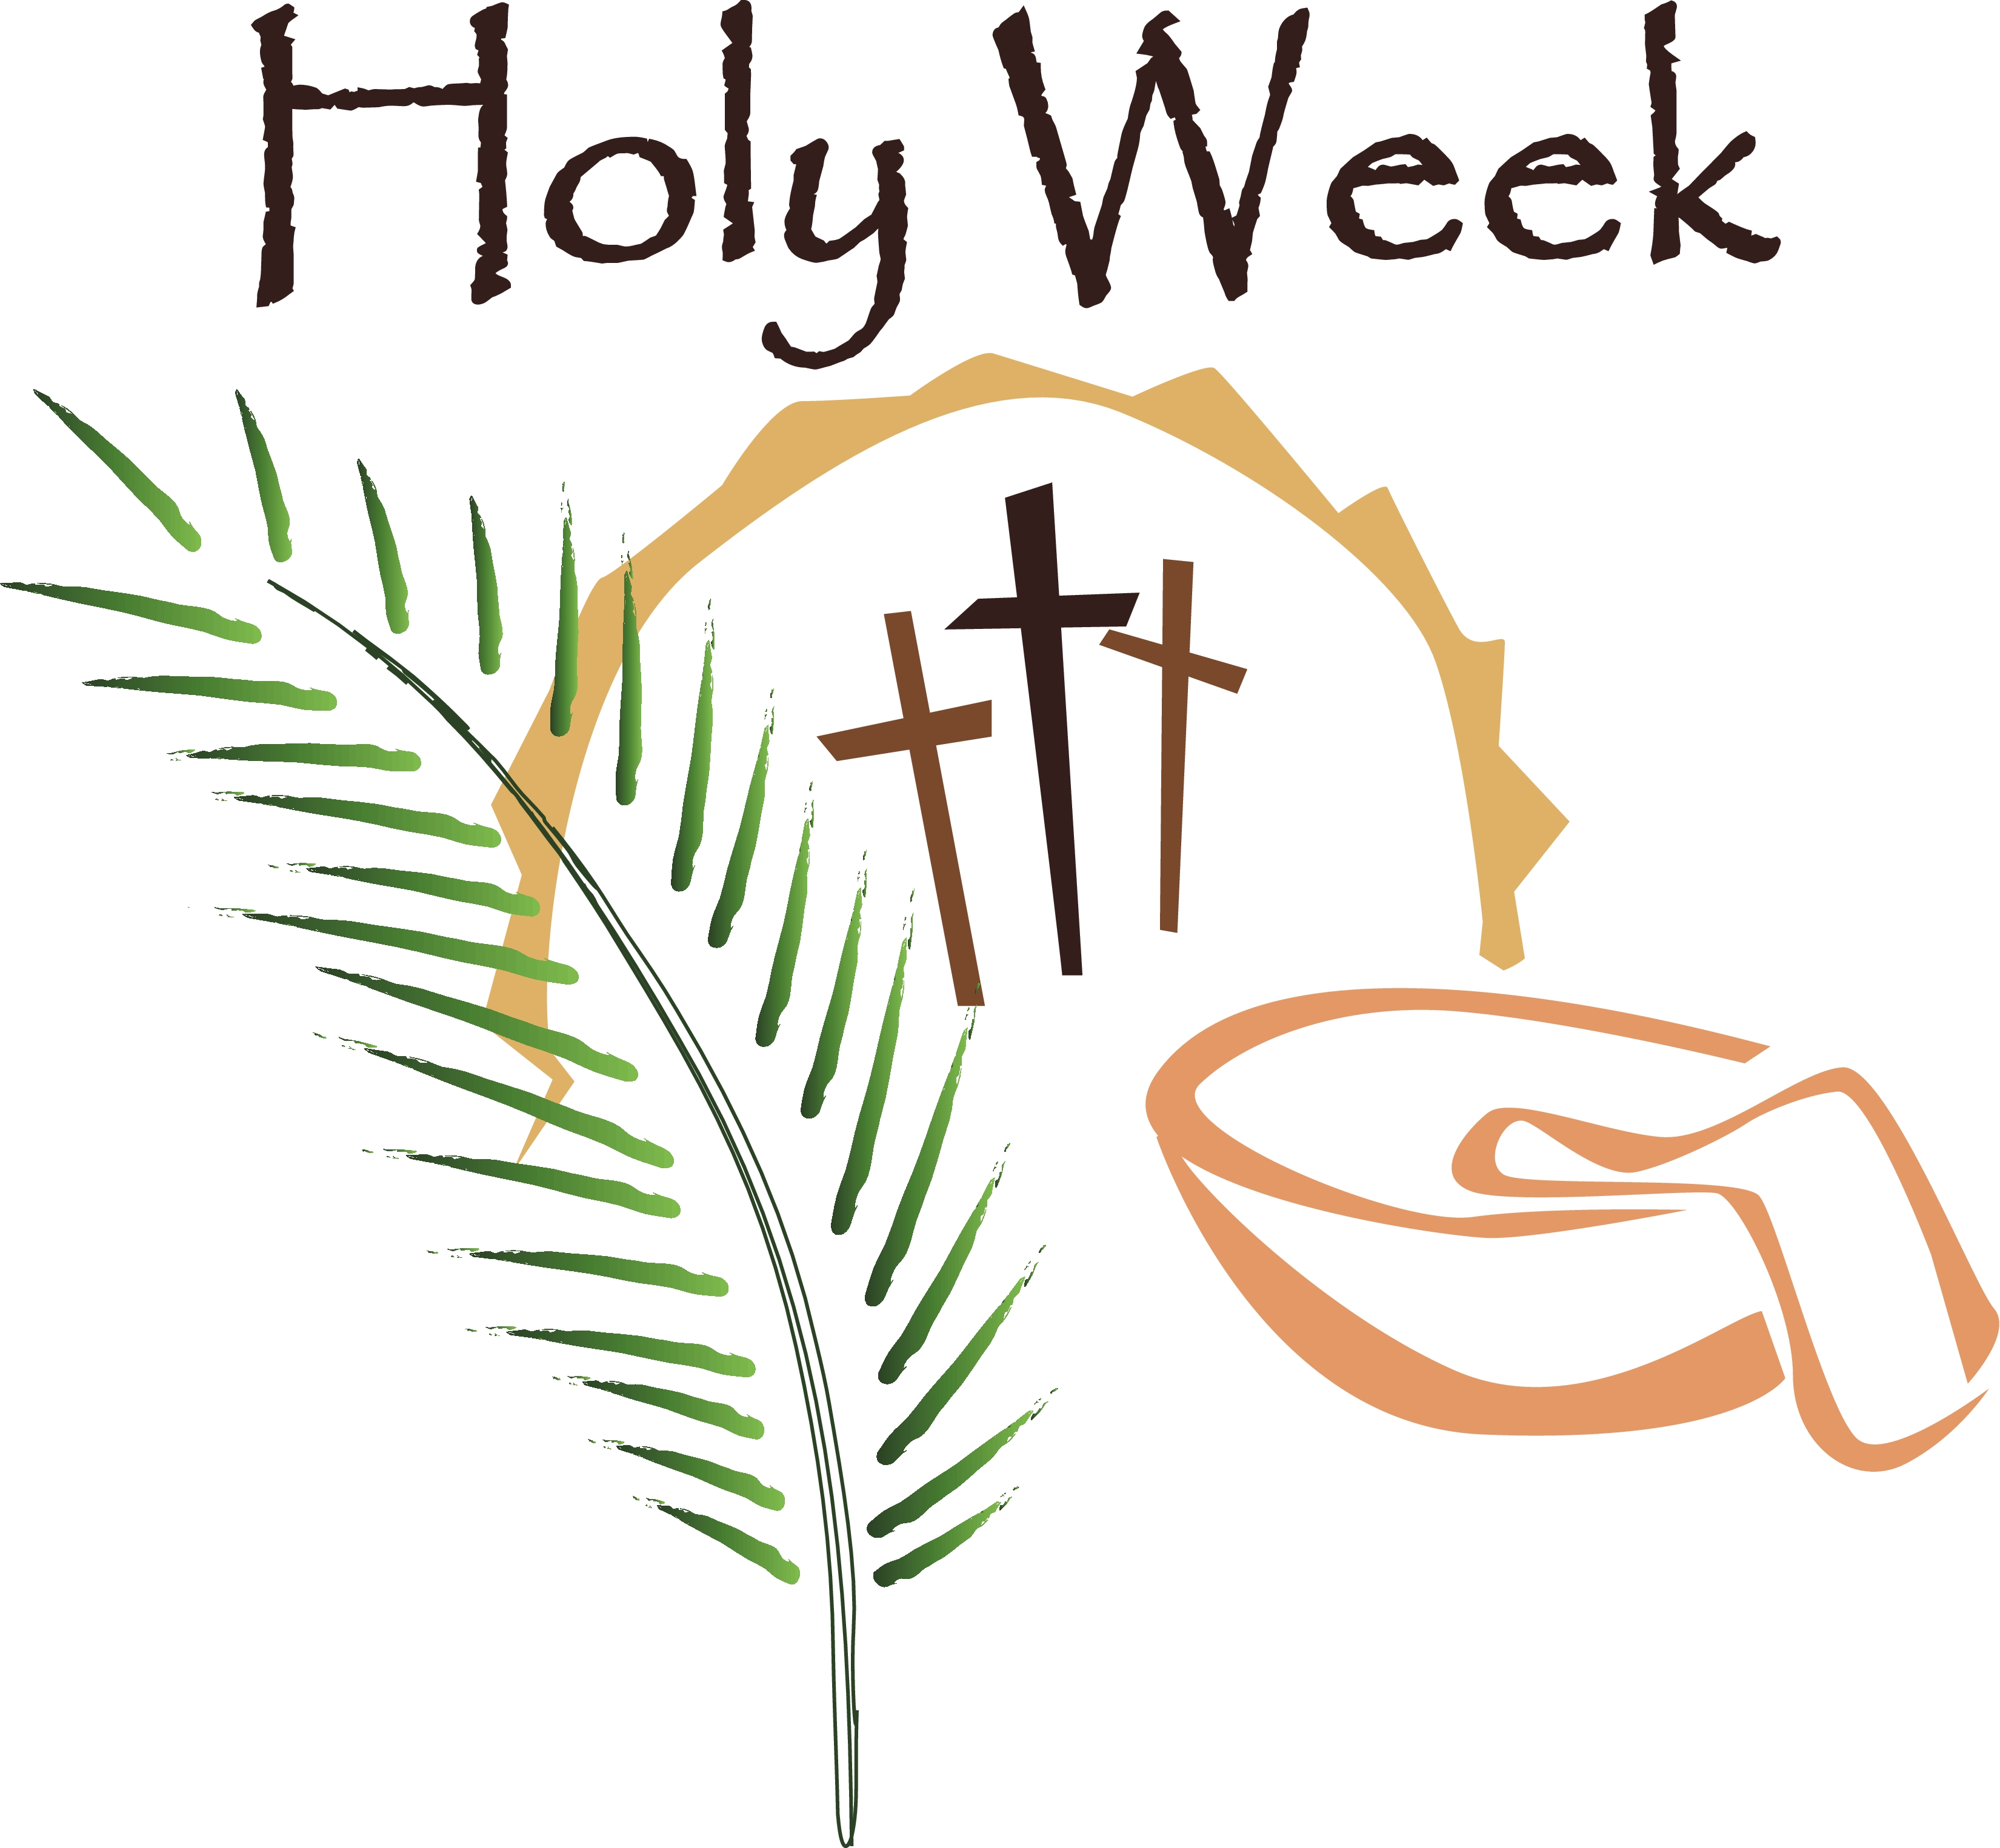 Holy Week!